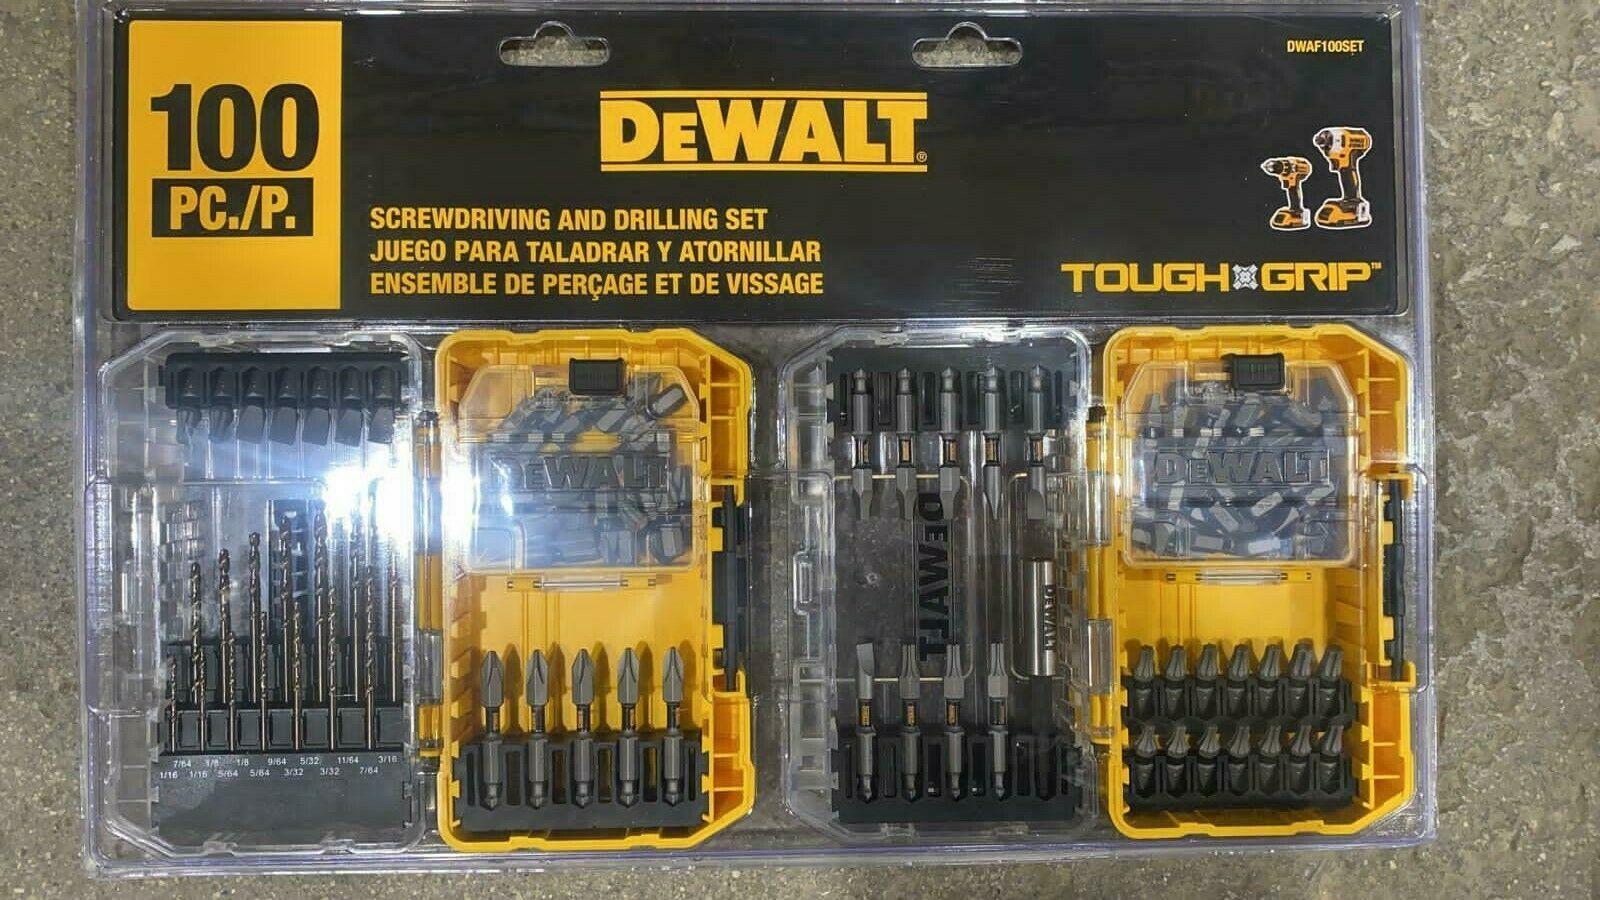 Toughgrip 100-Piece Shank Screwdriver Bit Set. DEWALT.  We ship overseas - $39.59